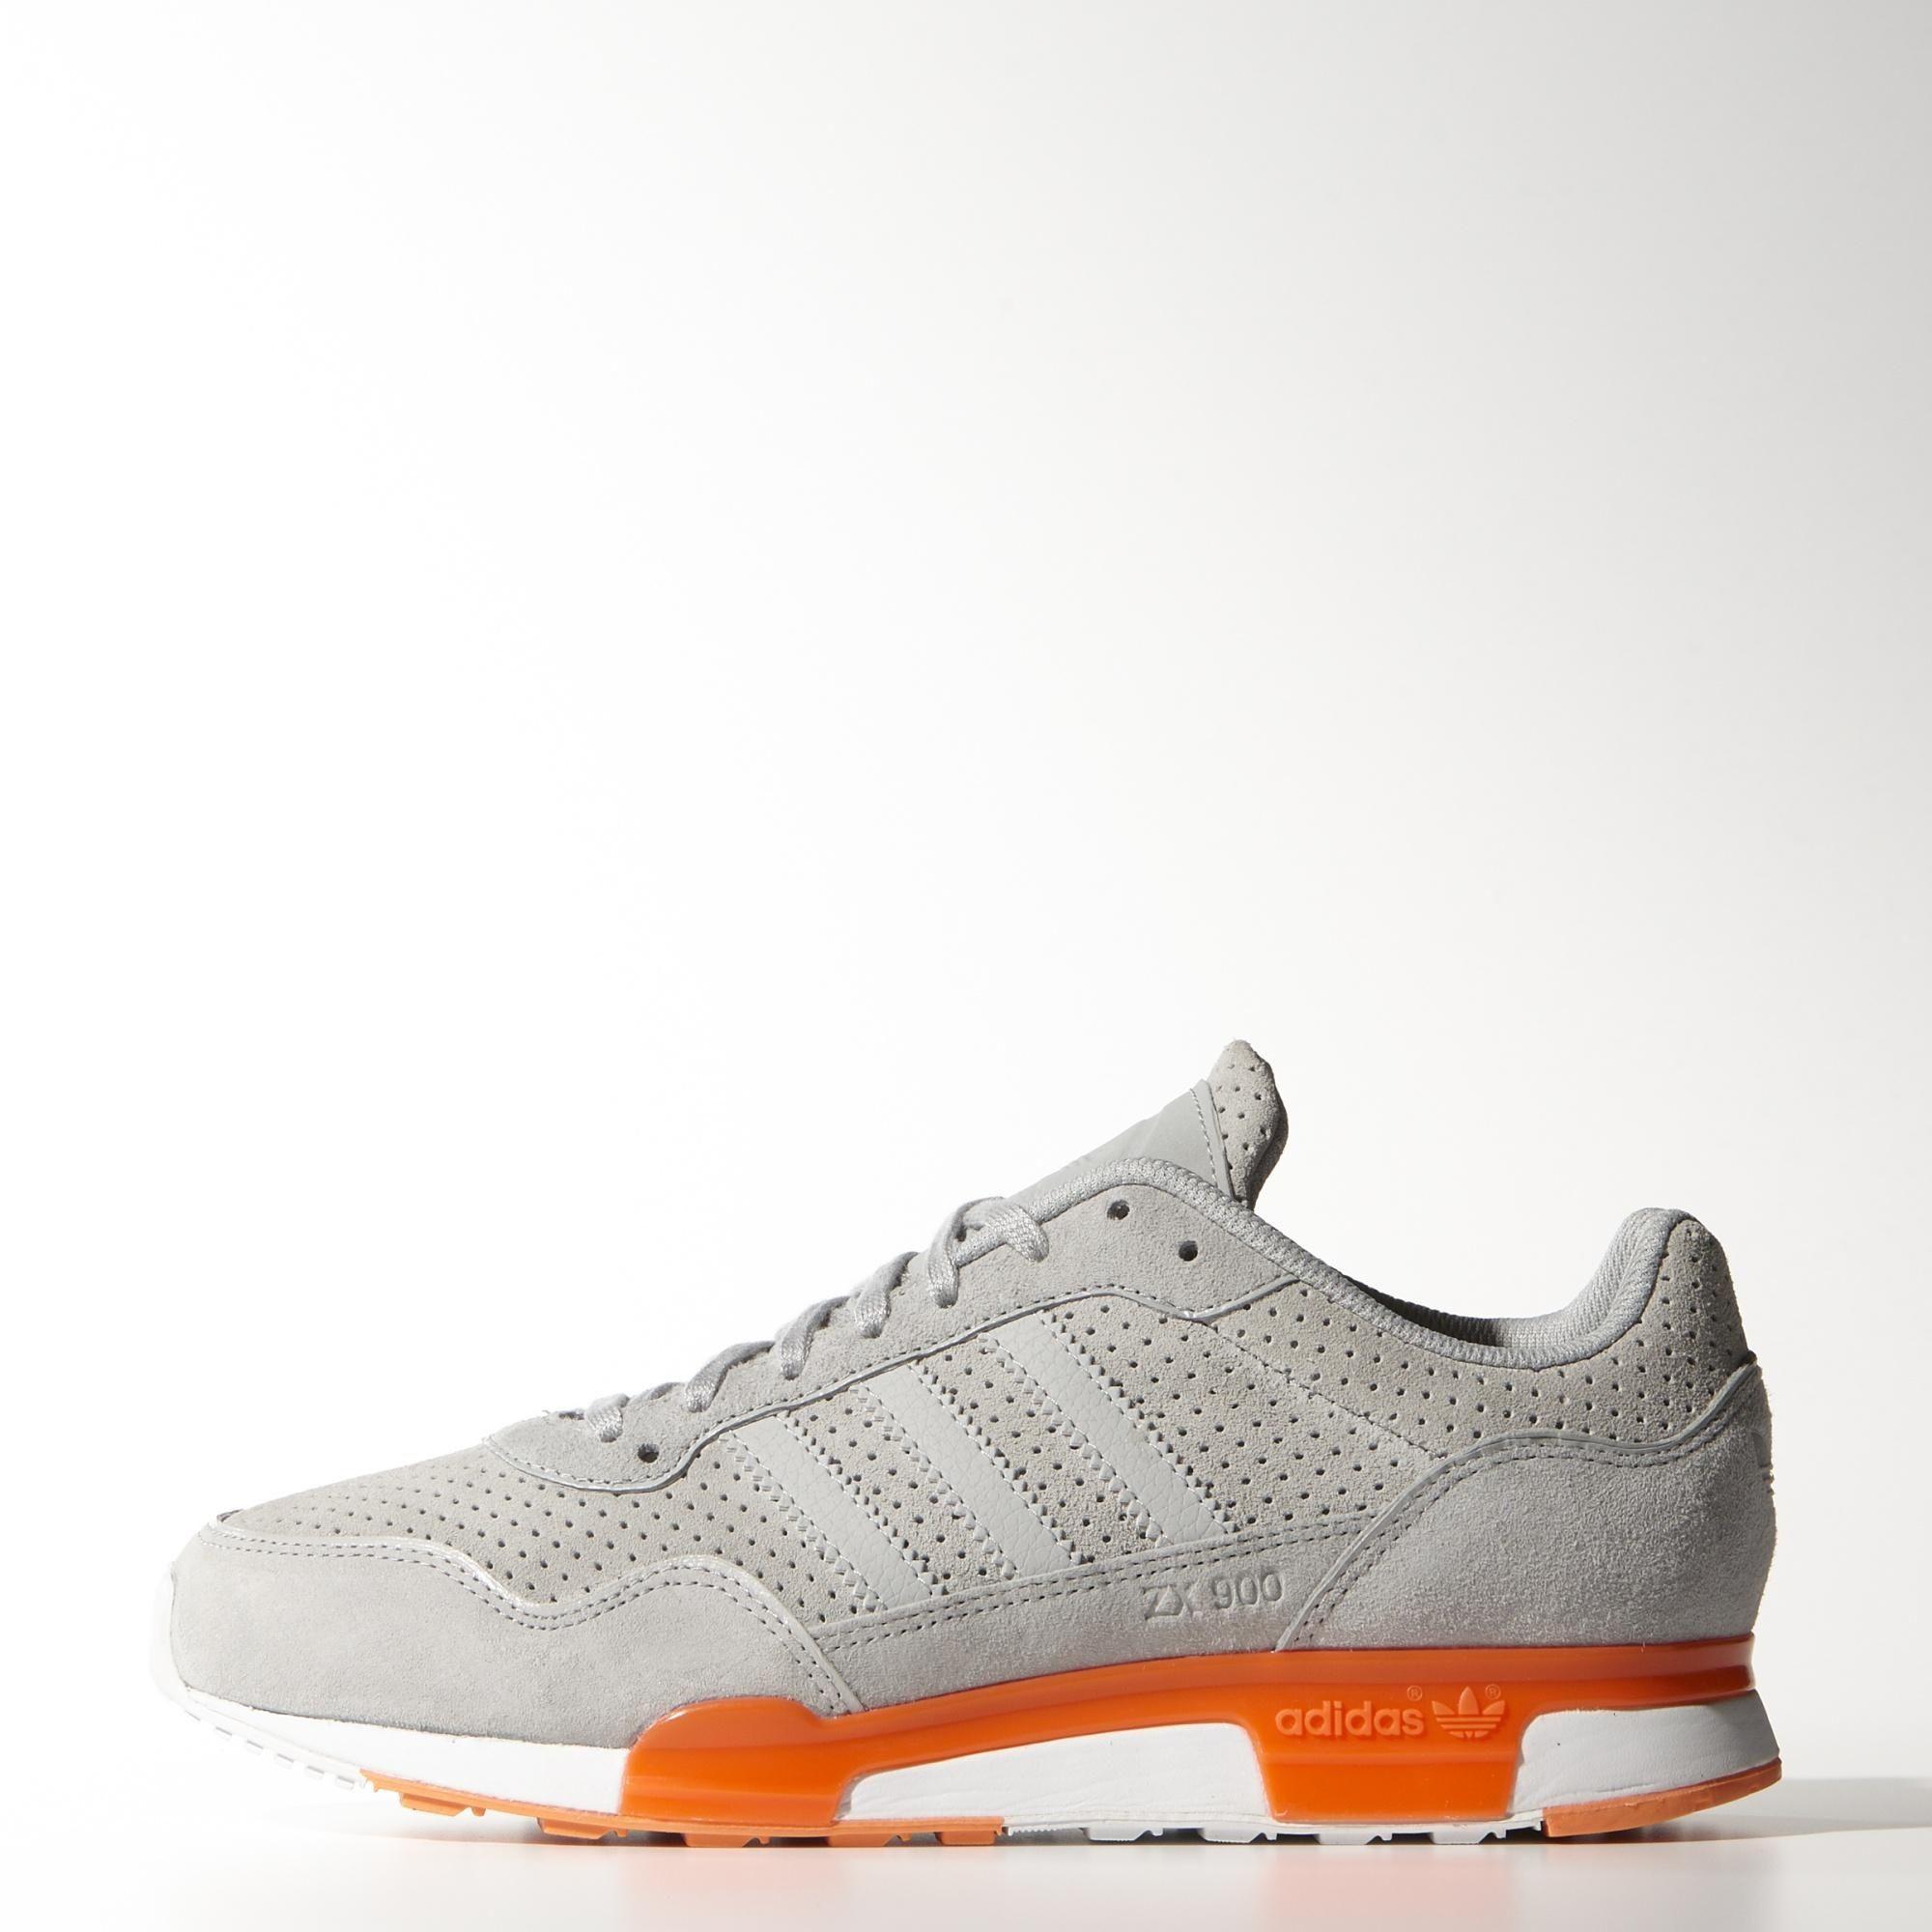 adidas zx 900 kopen